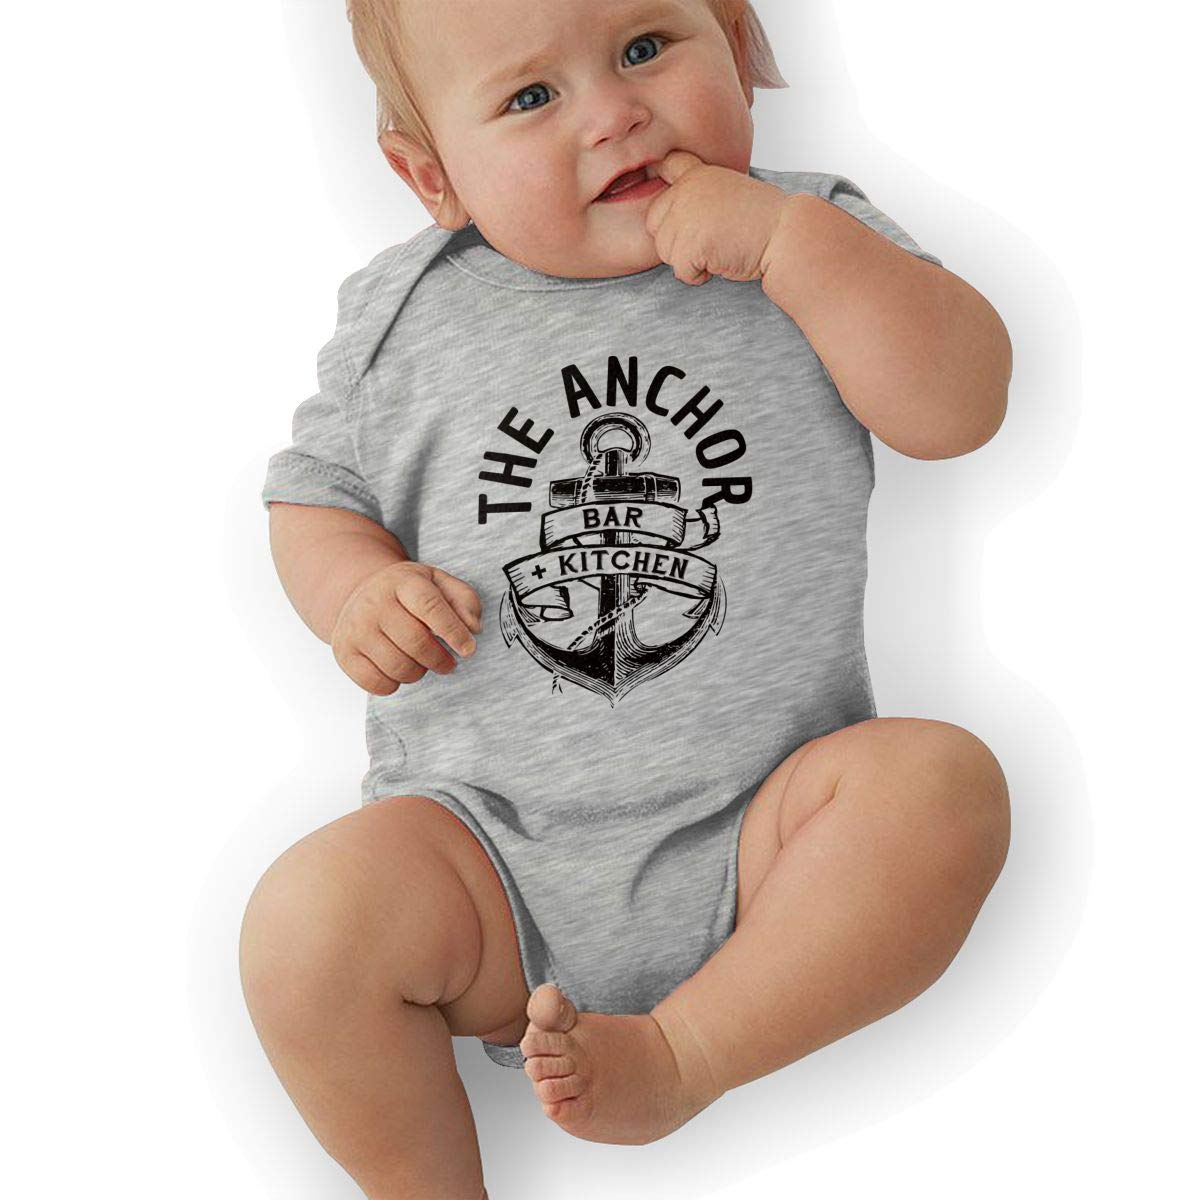 Toddler Baby Boys Bodysuit Short-Sleeve Onesie The Anchor Bar Kitchen Print Rompers Spring Pajamas